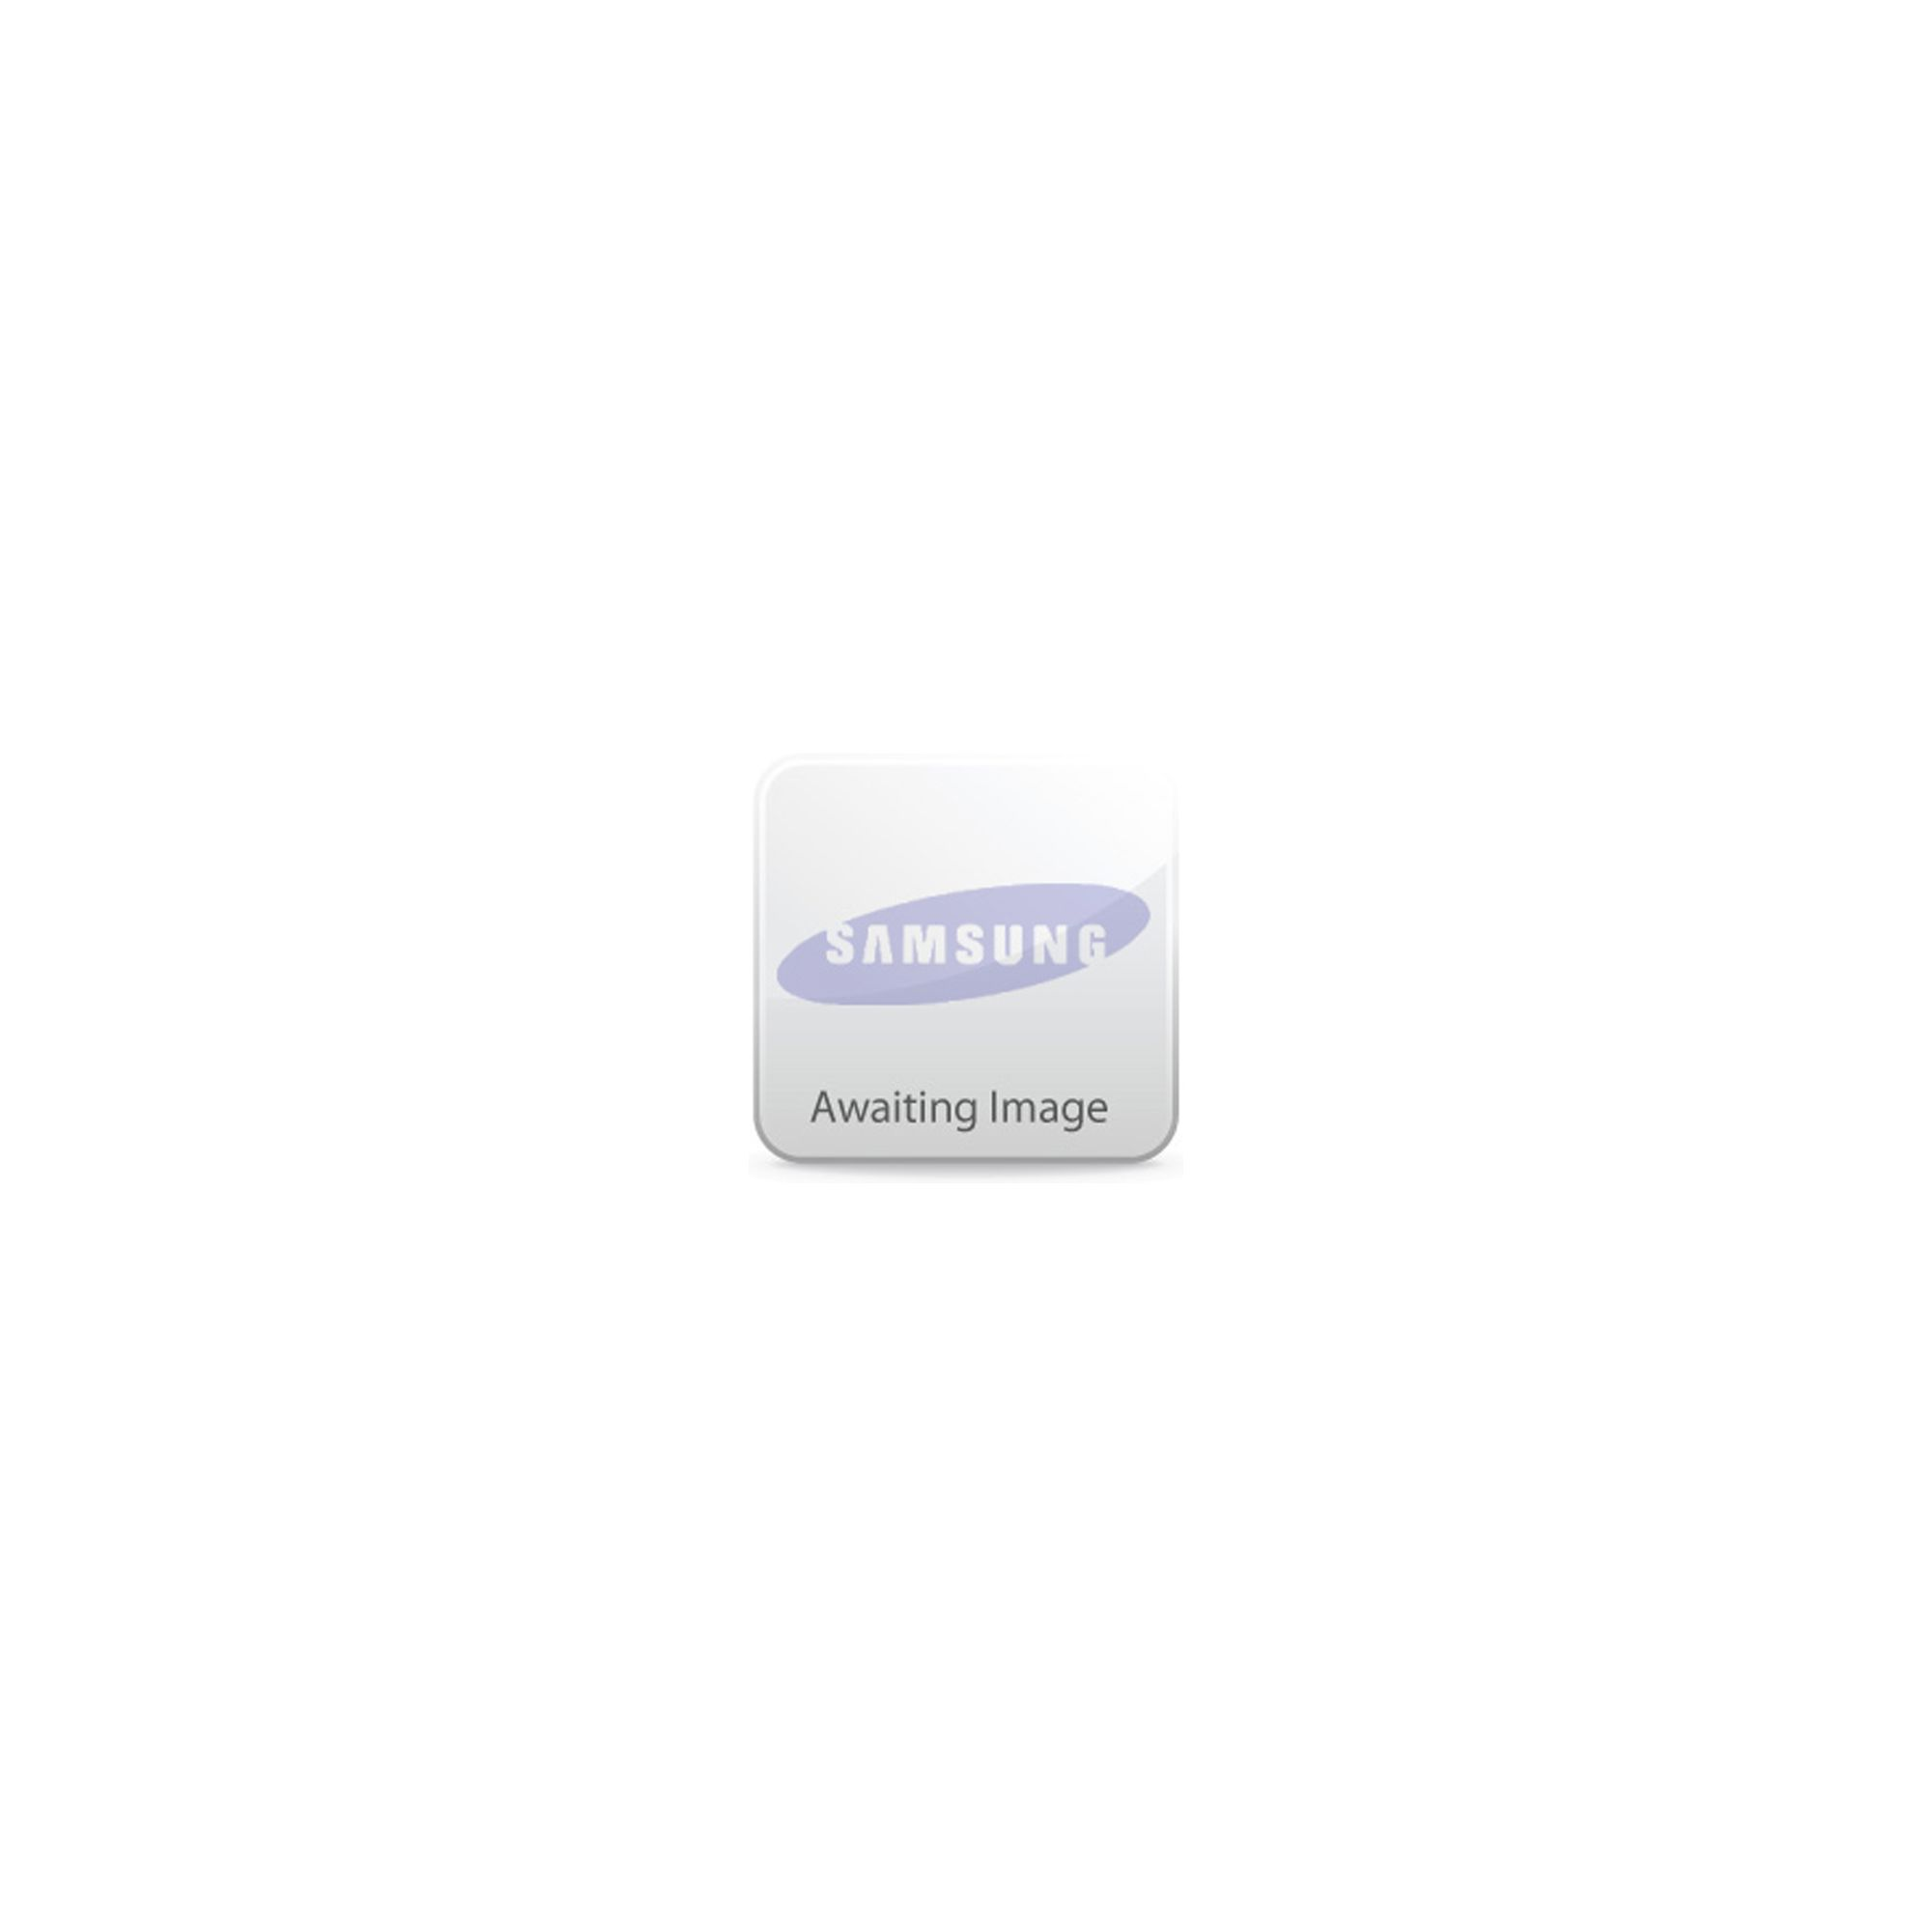 Samsung 4-bin Mailbox for SCX-6545N Printer at Tesco Direct